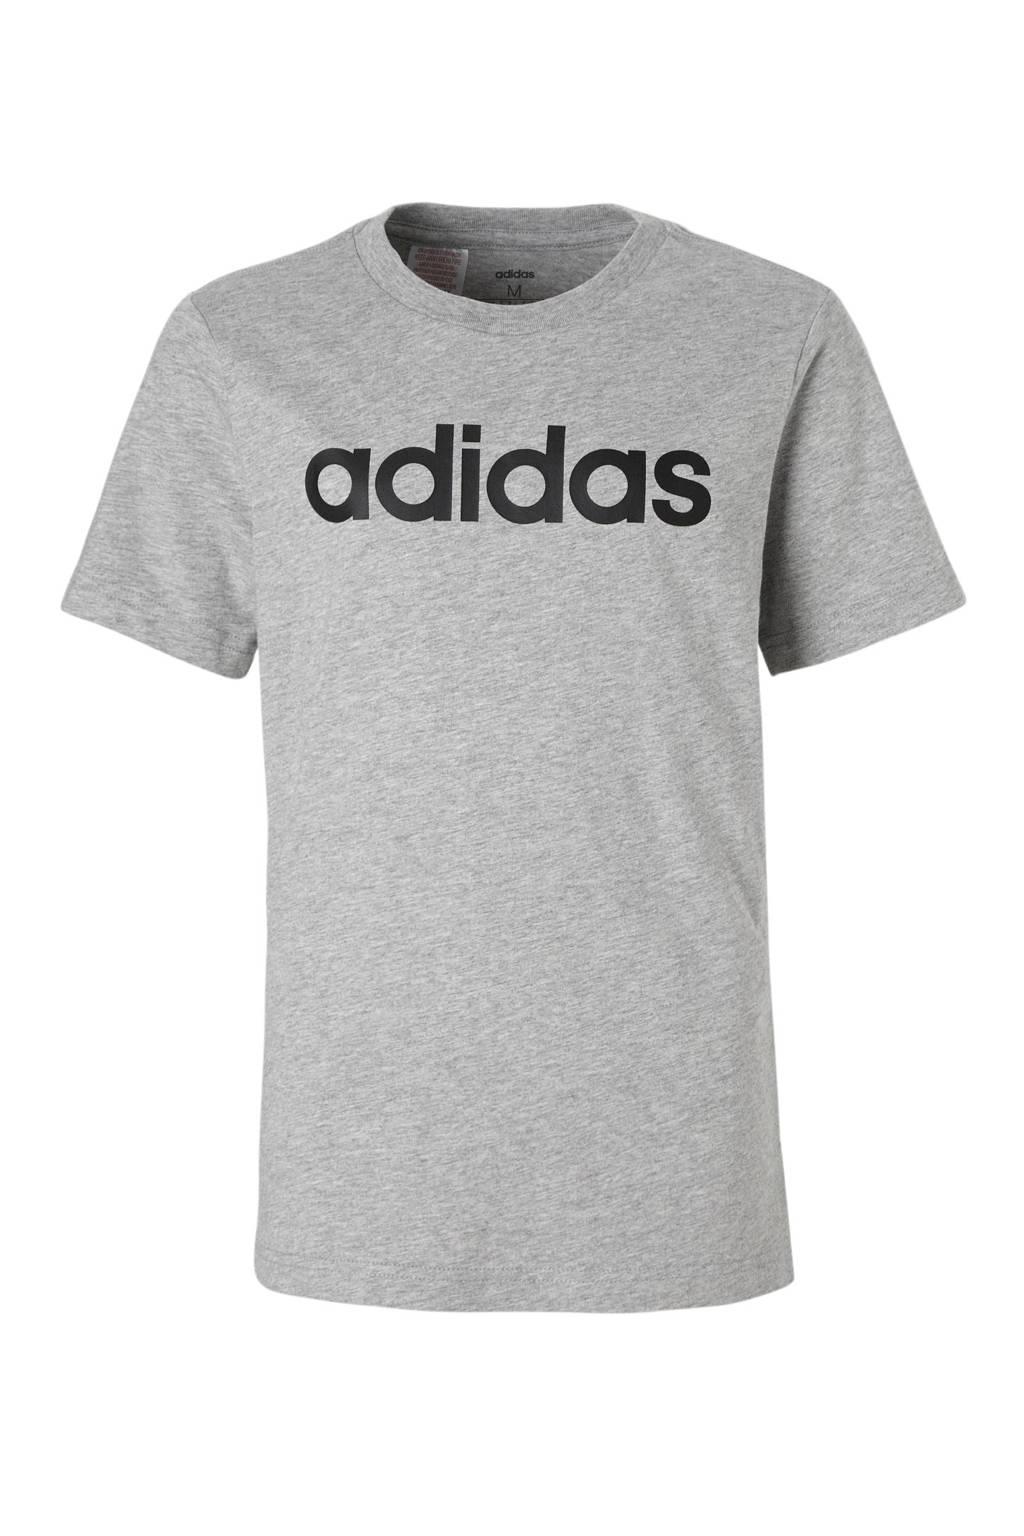 adidas performance   performance sport T-shirt grijs, Grijs